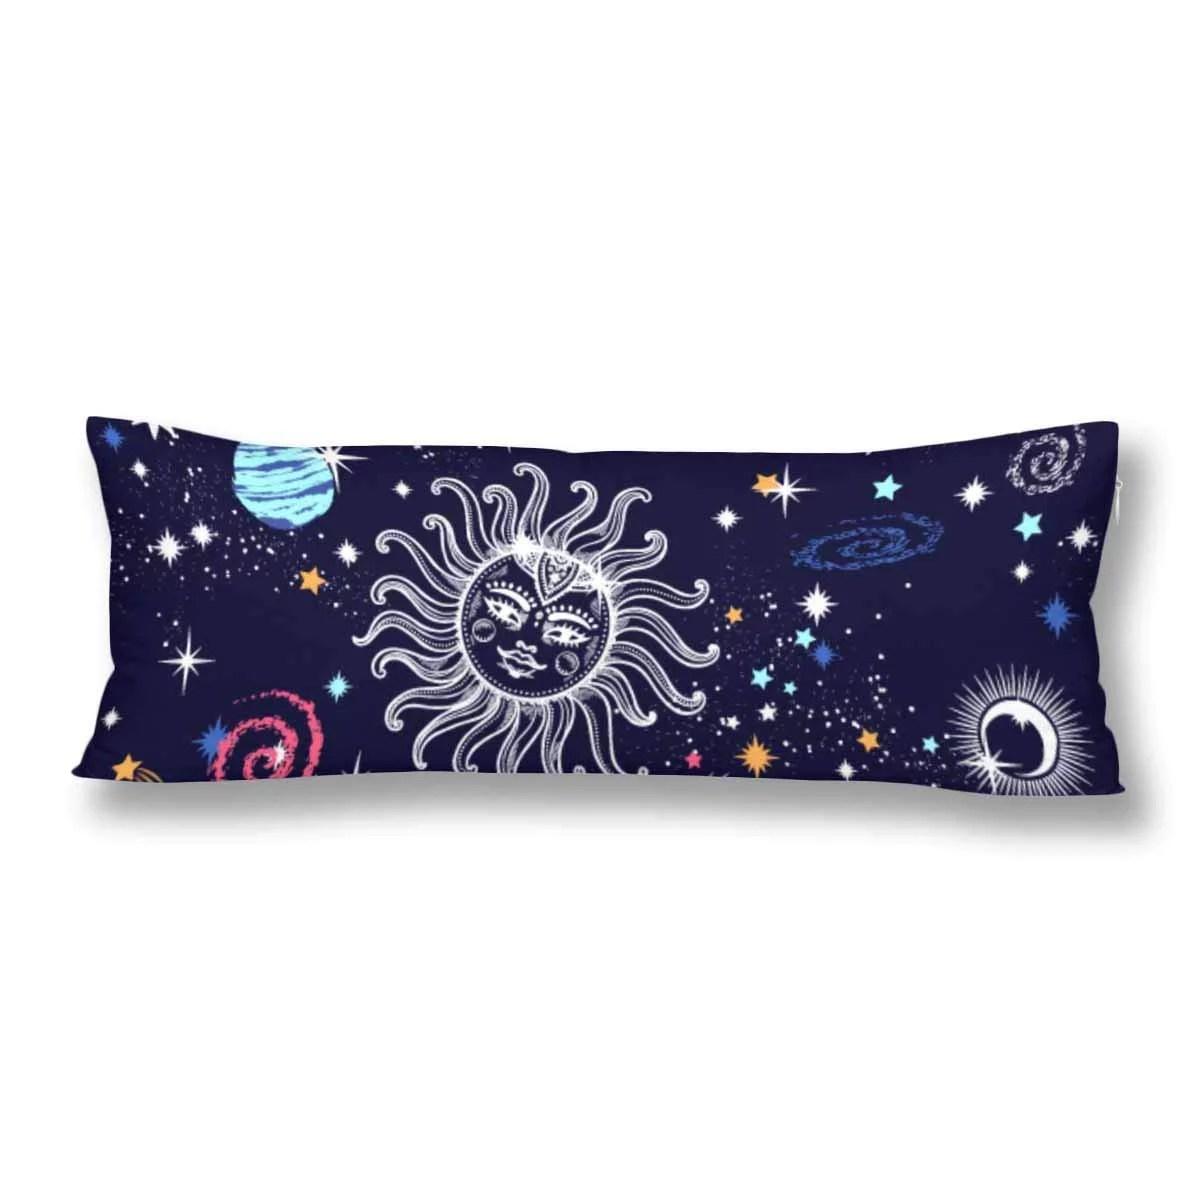 abphoto galaxy sun and moon body pillow covers pillowcase throw pillows 20x60 inch